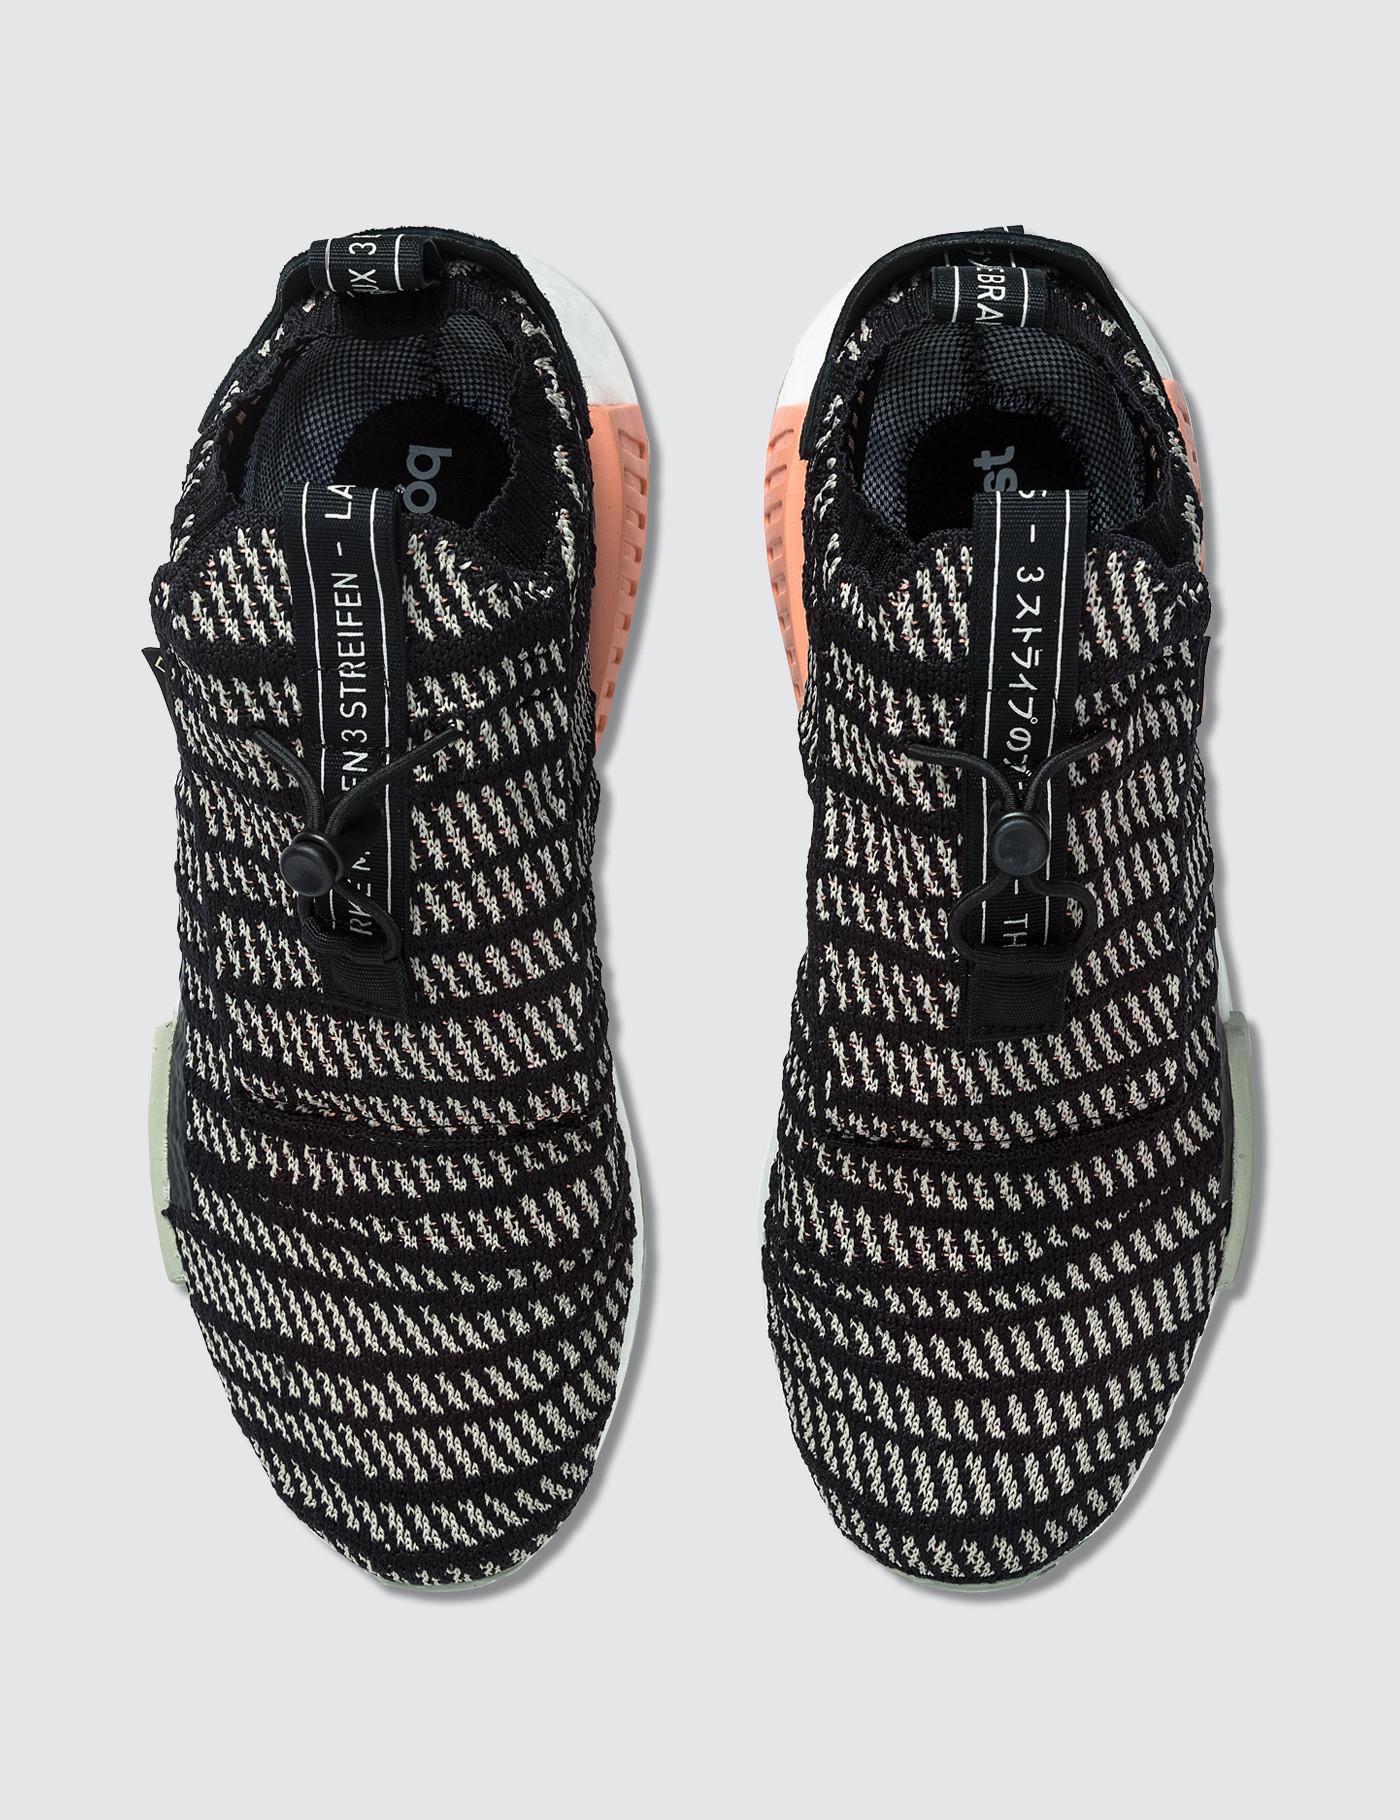 71713e3500bcc Lyst - adidas Originals Nmd Ts1 Primeknit Gtx in Black for Men